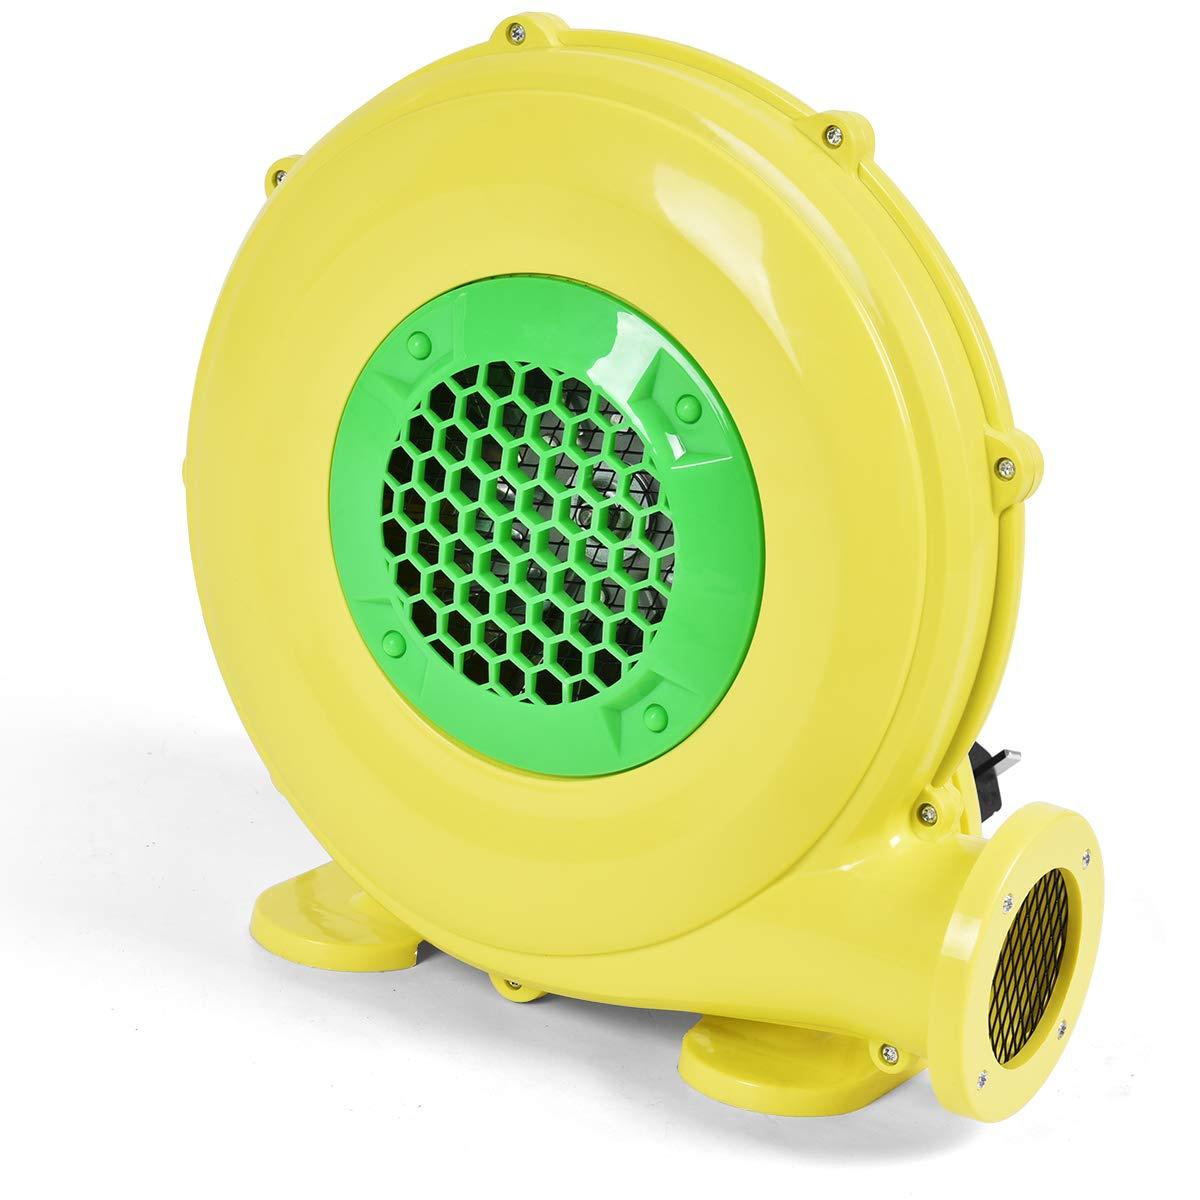 Costzon Air Blower, Pump Fan Commercial Inflatable Bouncer Blower, Perfect for Inflatable Bounce House, Jumper, Bouncy Castle 480 Watt 0.64HP Yellow